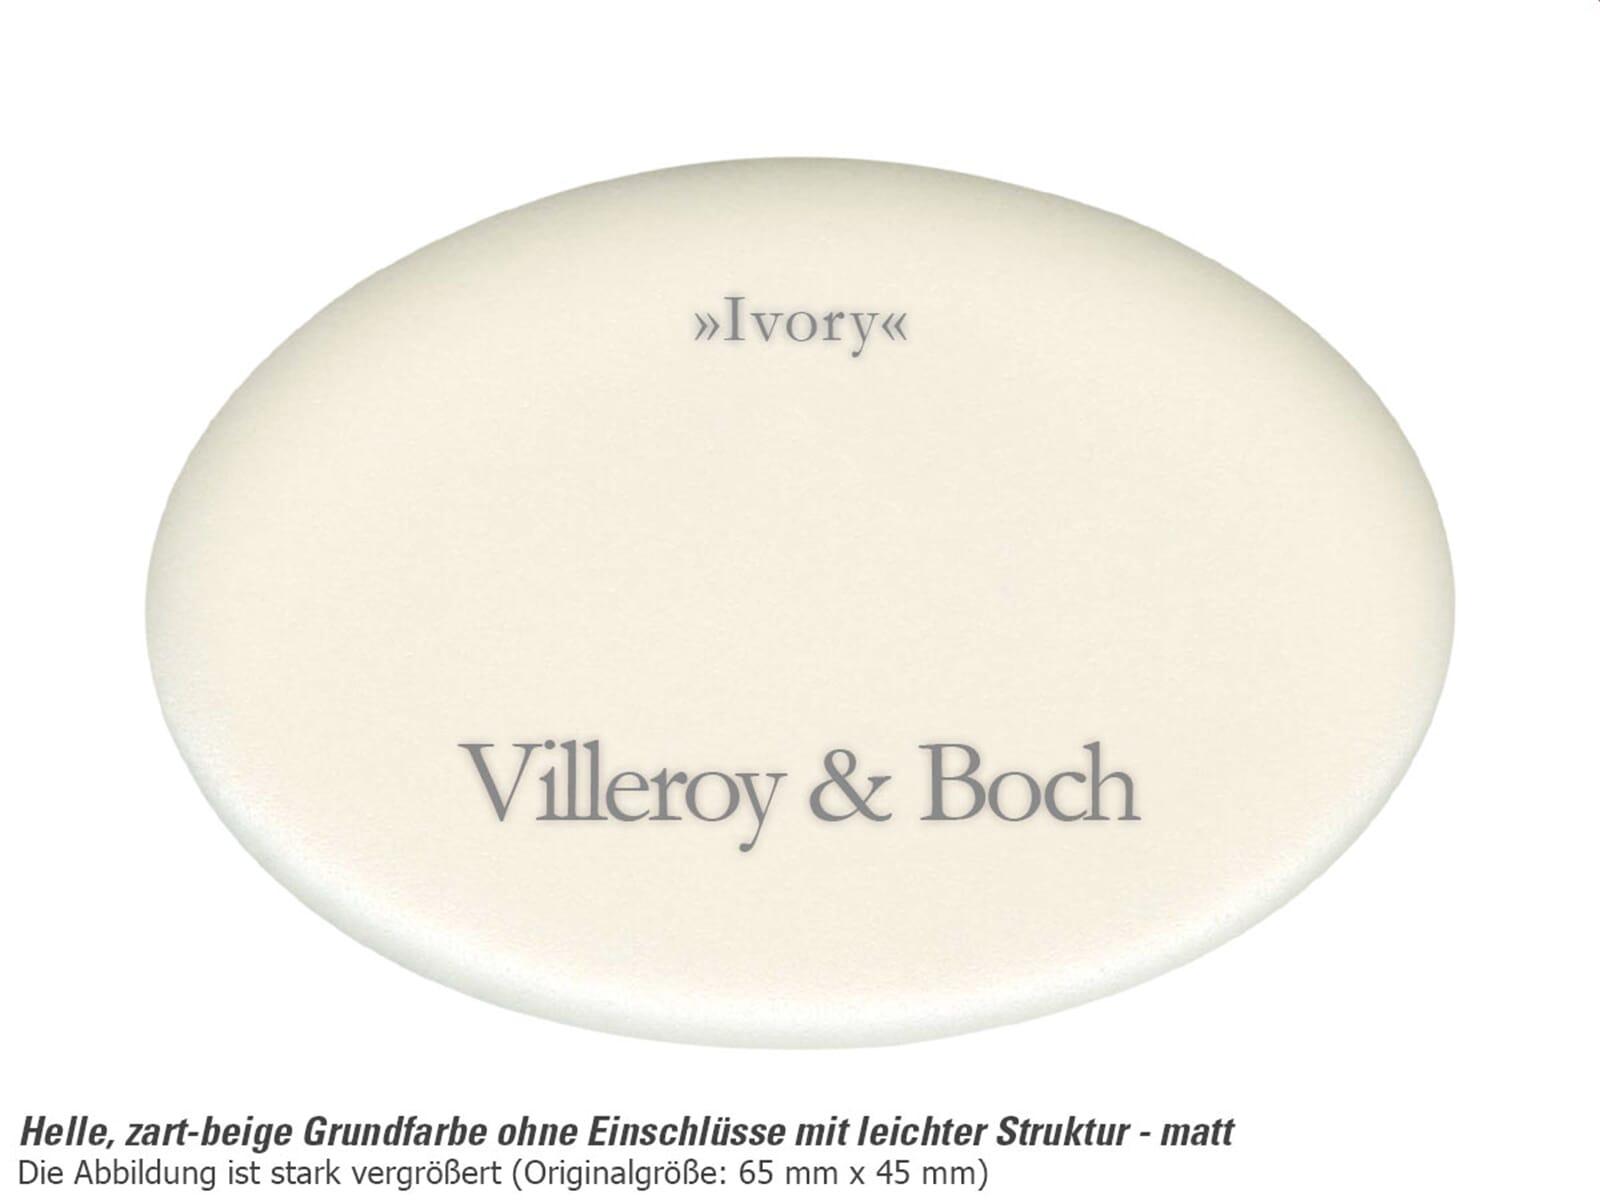 Villeroy & Boch Siluet 60 R - 3337 02 FU Ivory Keramikspüle Excenterbetätigung